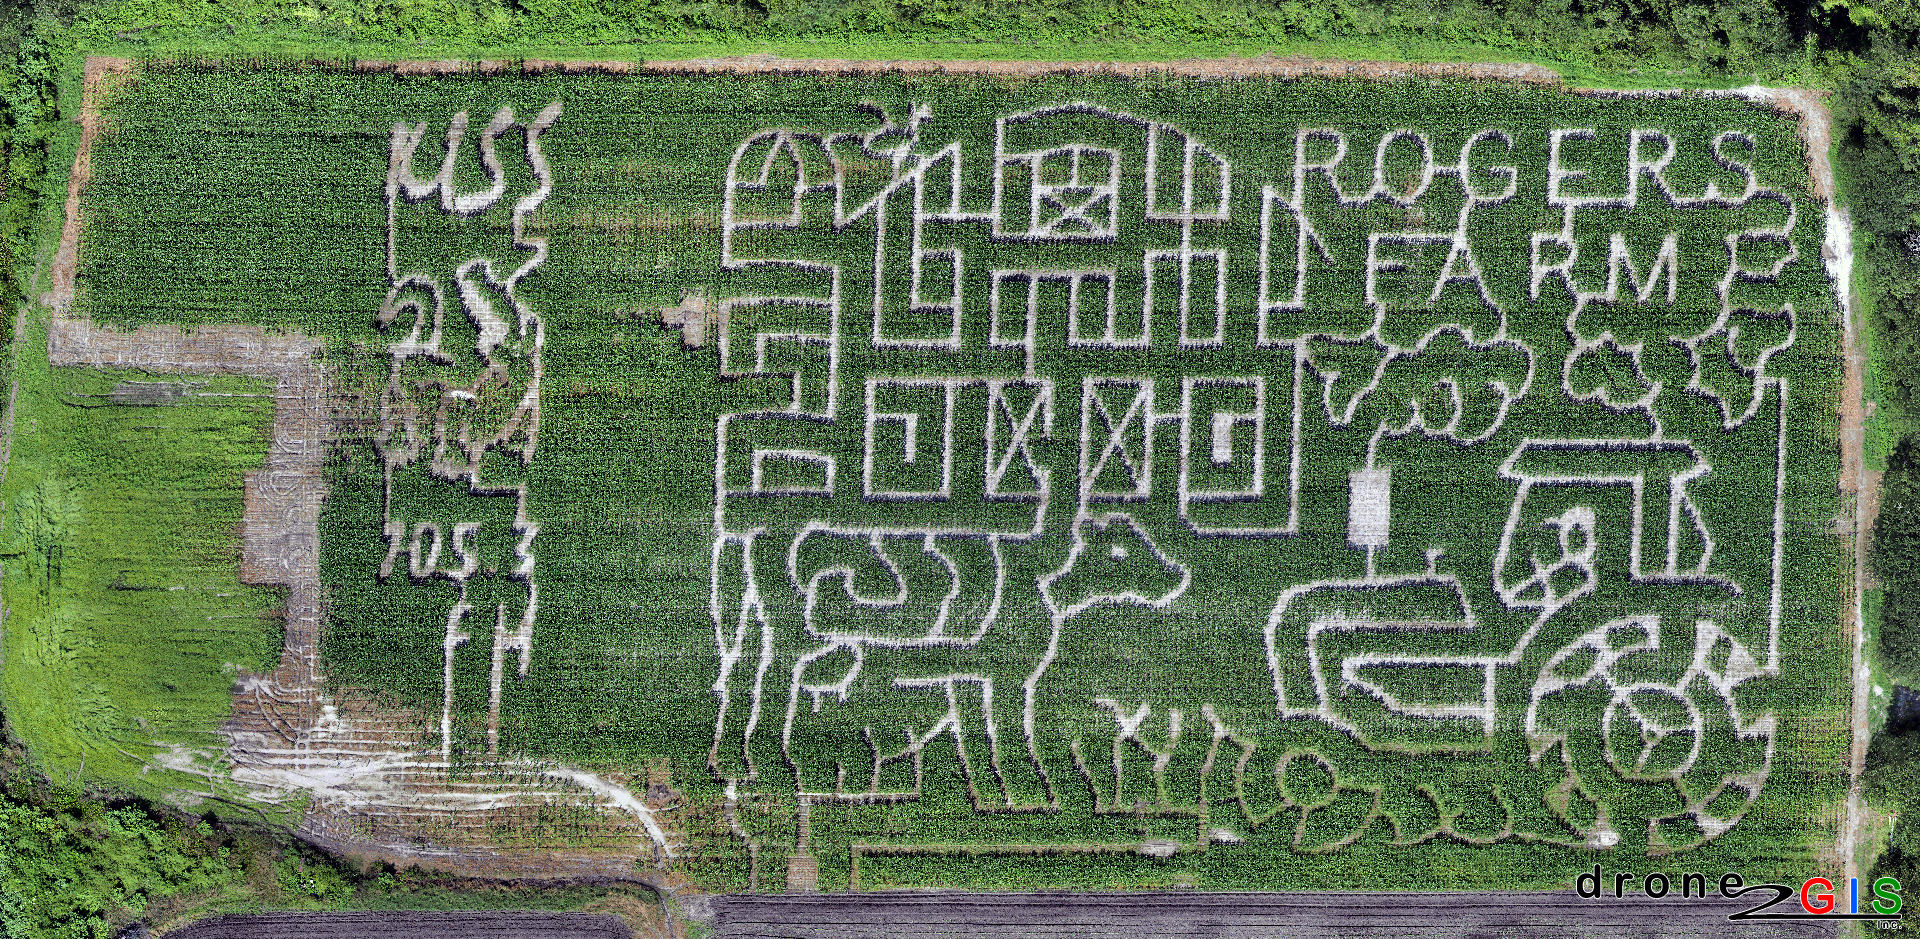 Rogers Farm Corn Maze 2015